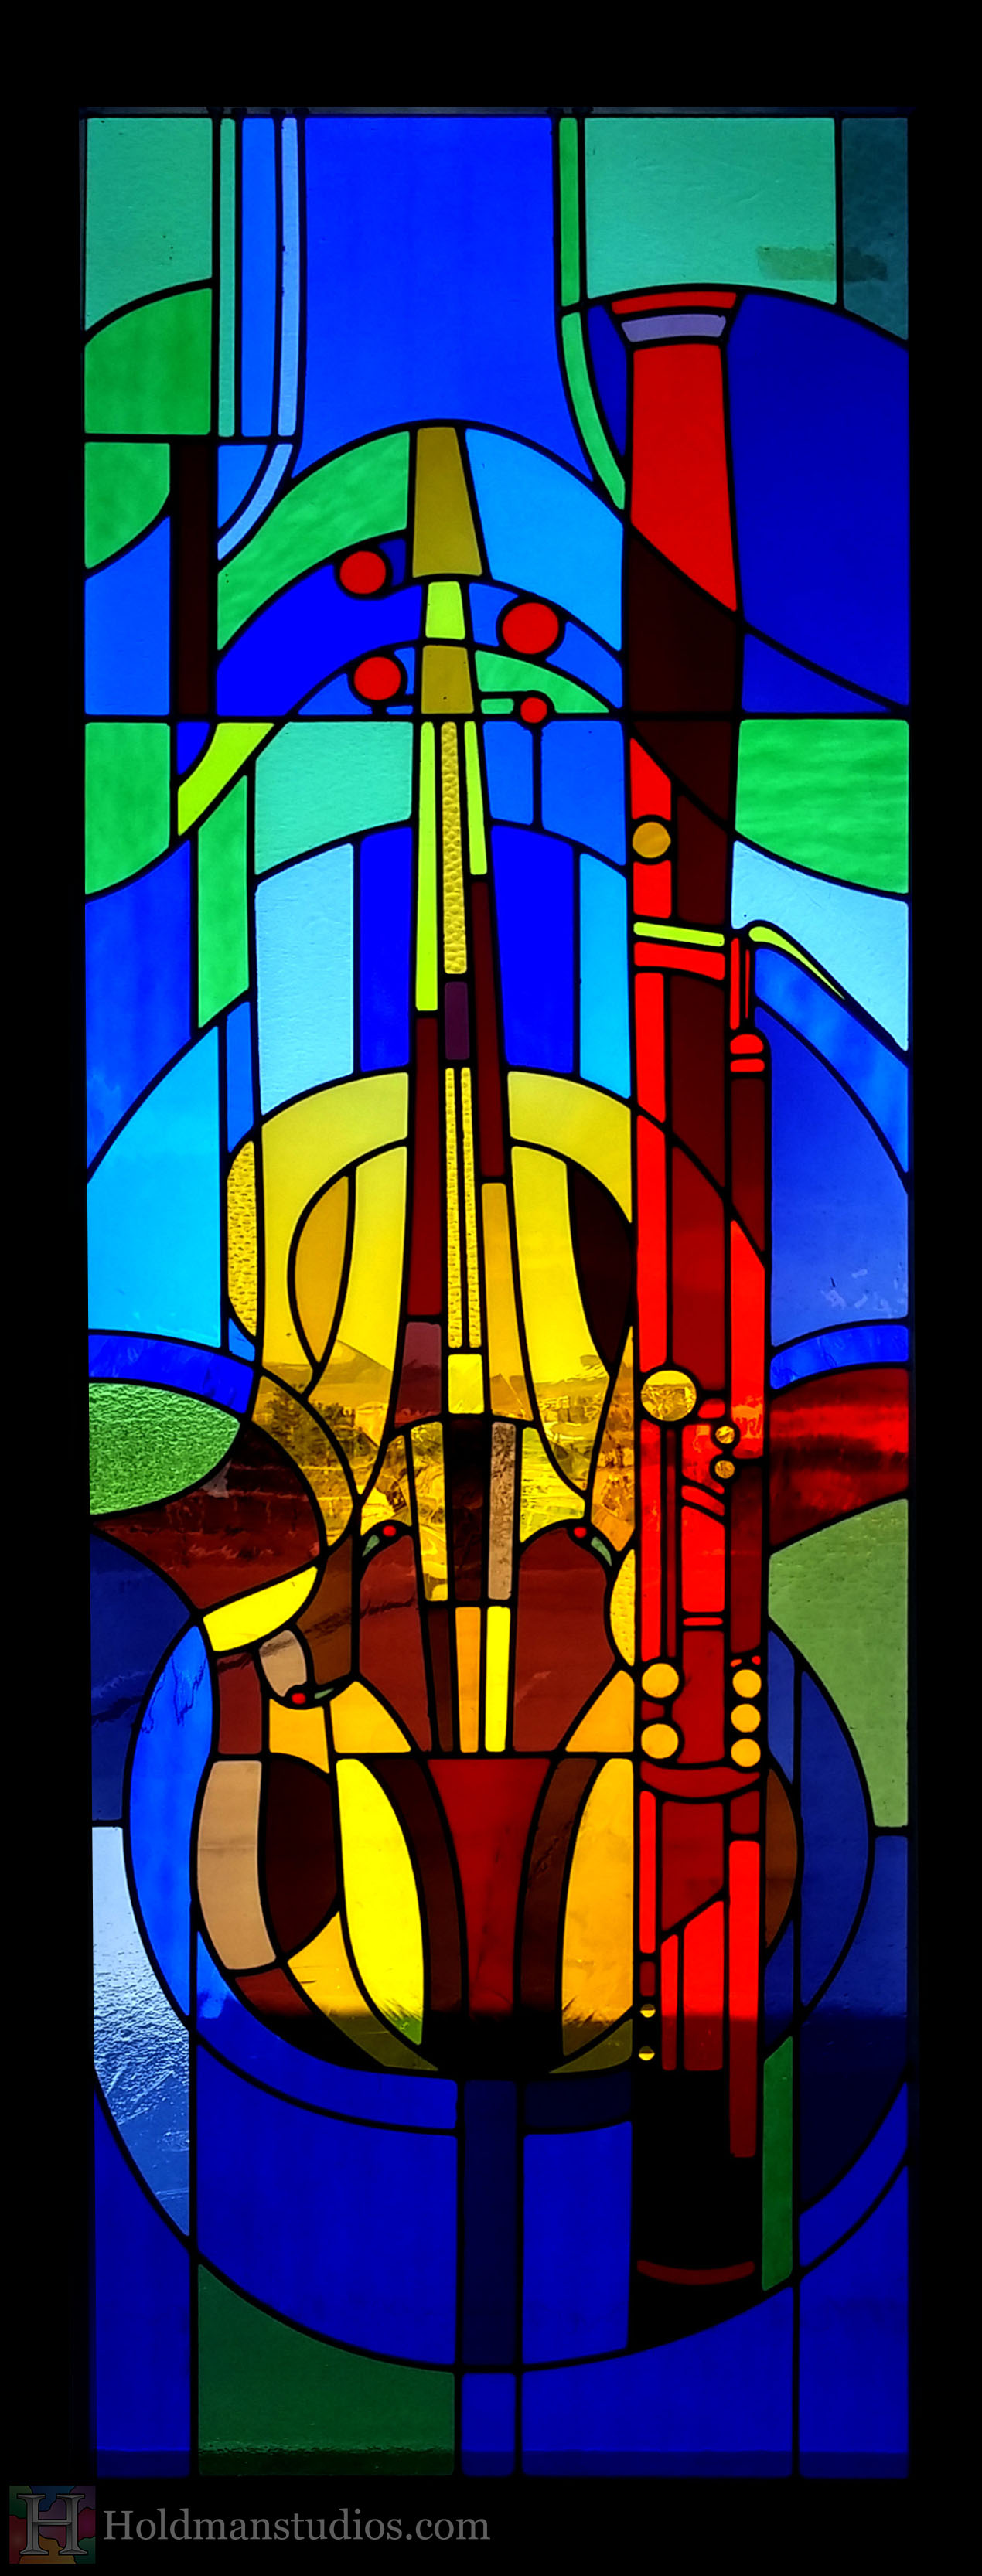 holdman-studios-stained-glass-window-musical-instuments-violin-viola-bassoon-gometric-patterns.jpg